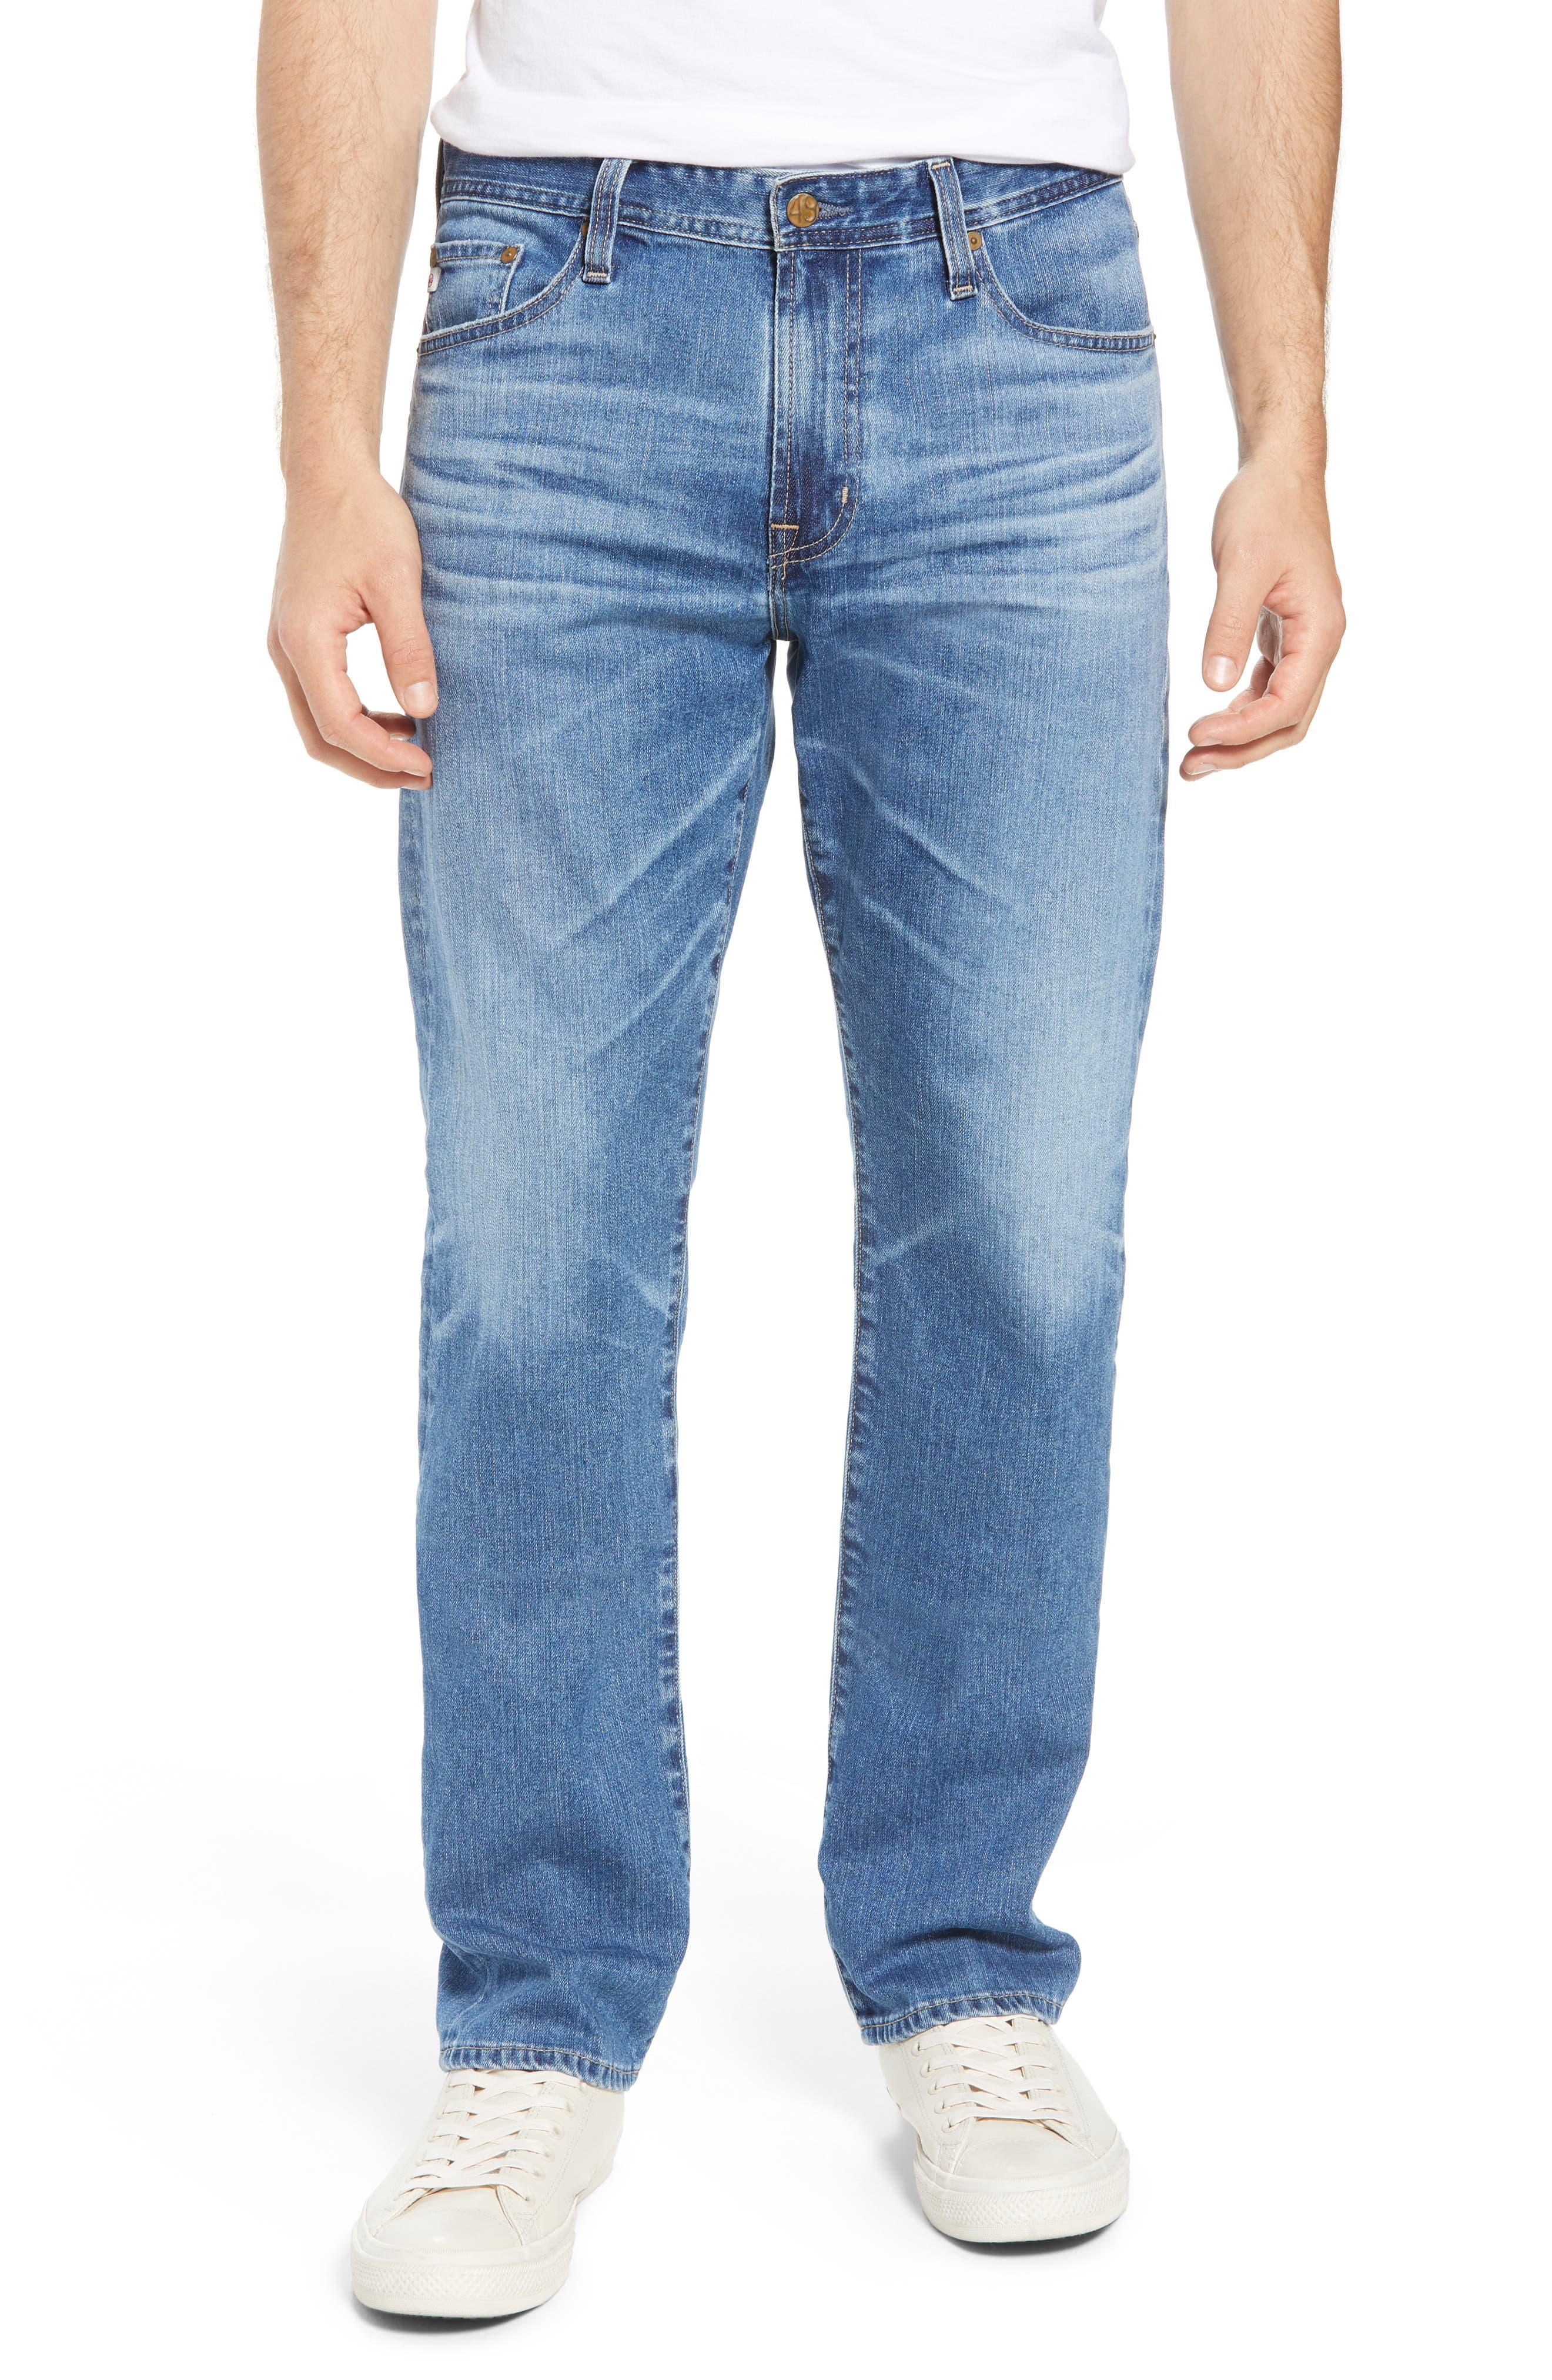 Everett Slim Straight Leg Jeans,                             Main thumbnail 1, color,                             15 Years Open Road